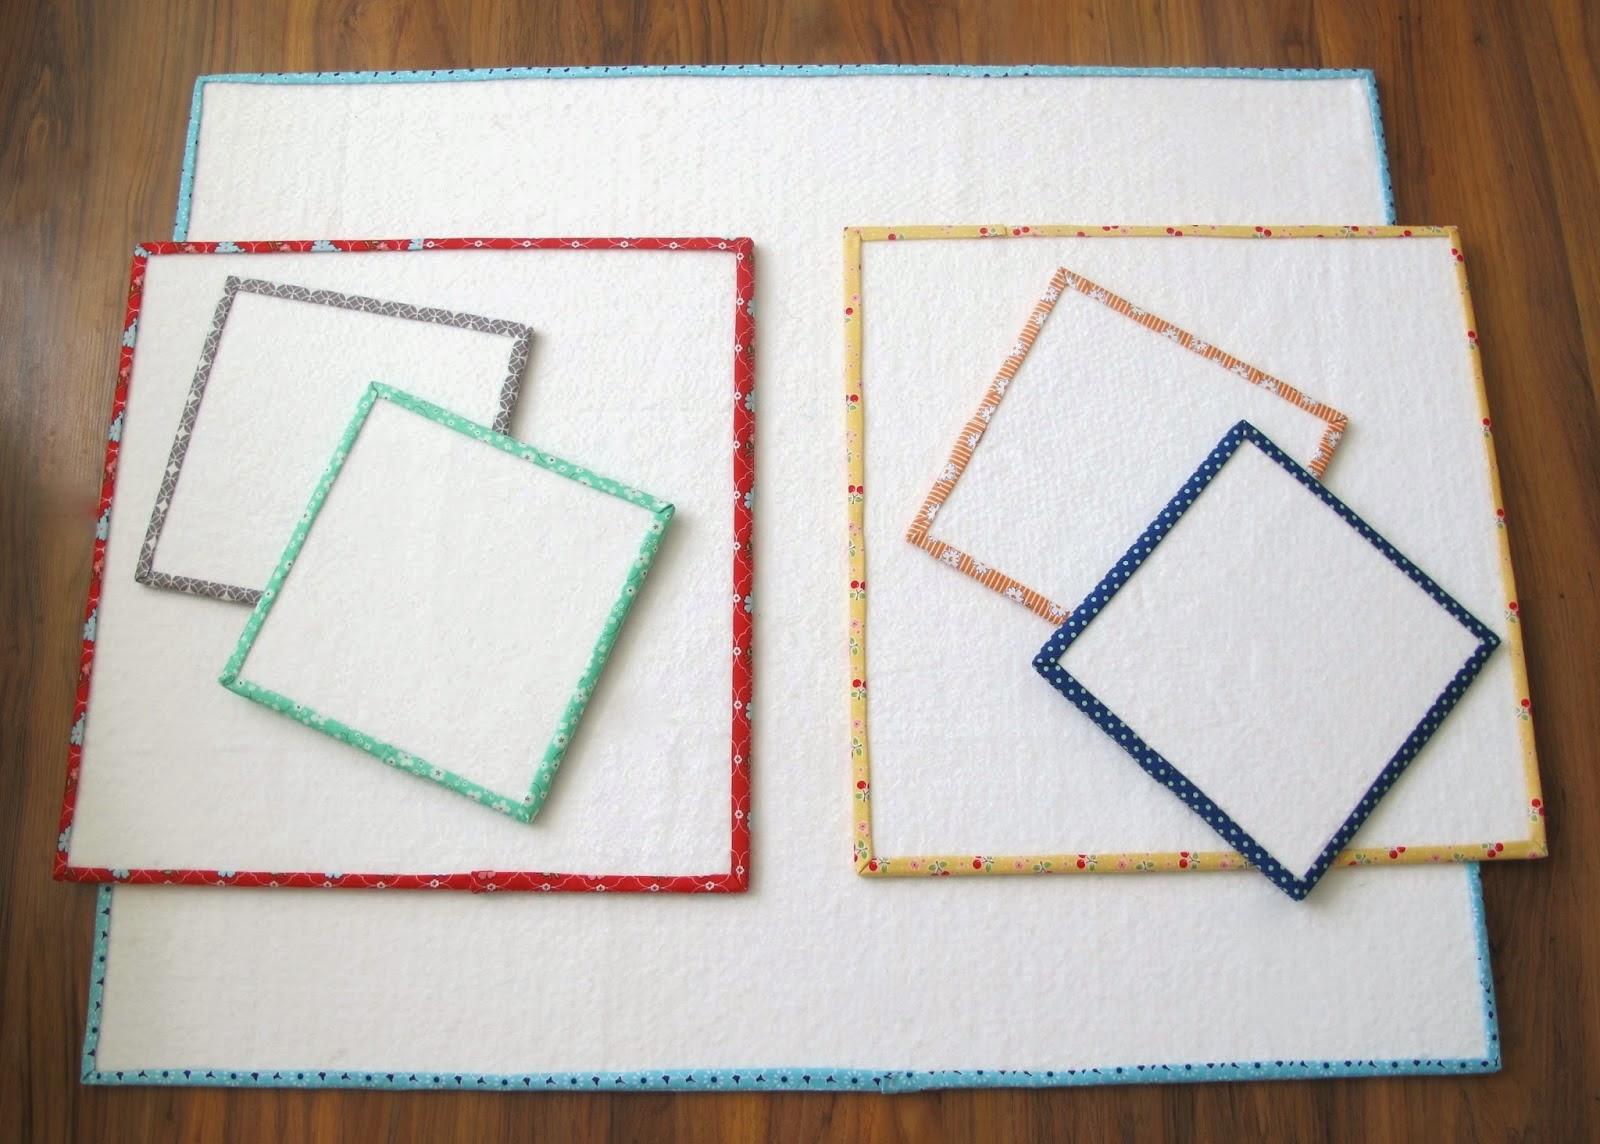 THE LADYBUG'S GARDEN: Quilters Portable Design Board : quilting design board - Adamdwight.com